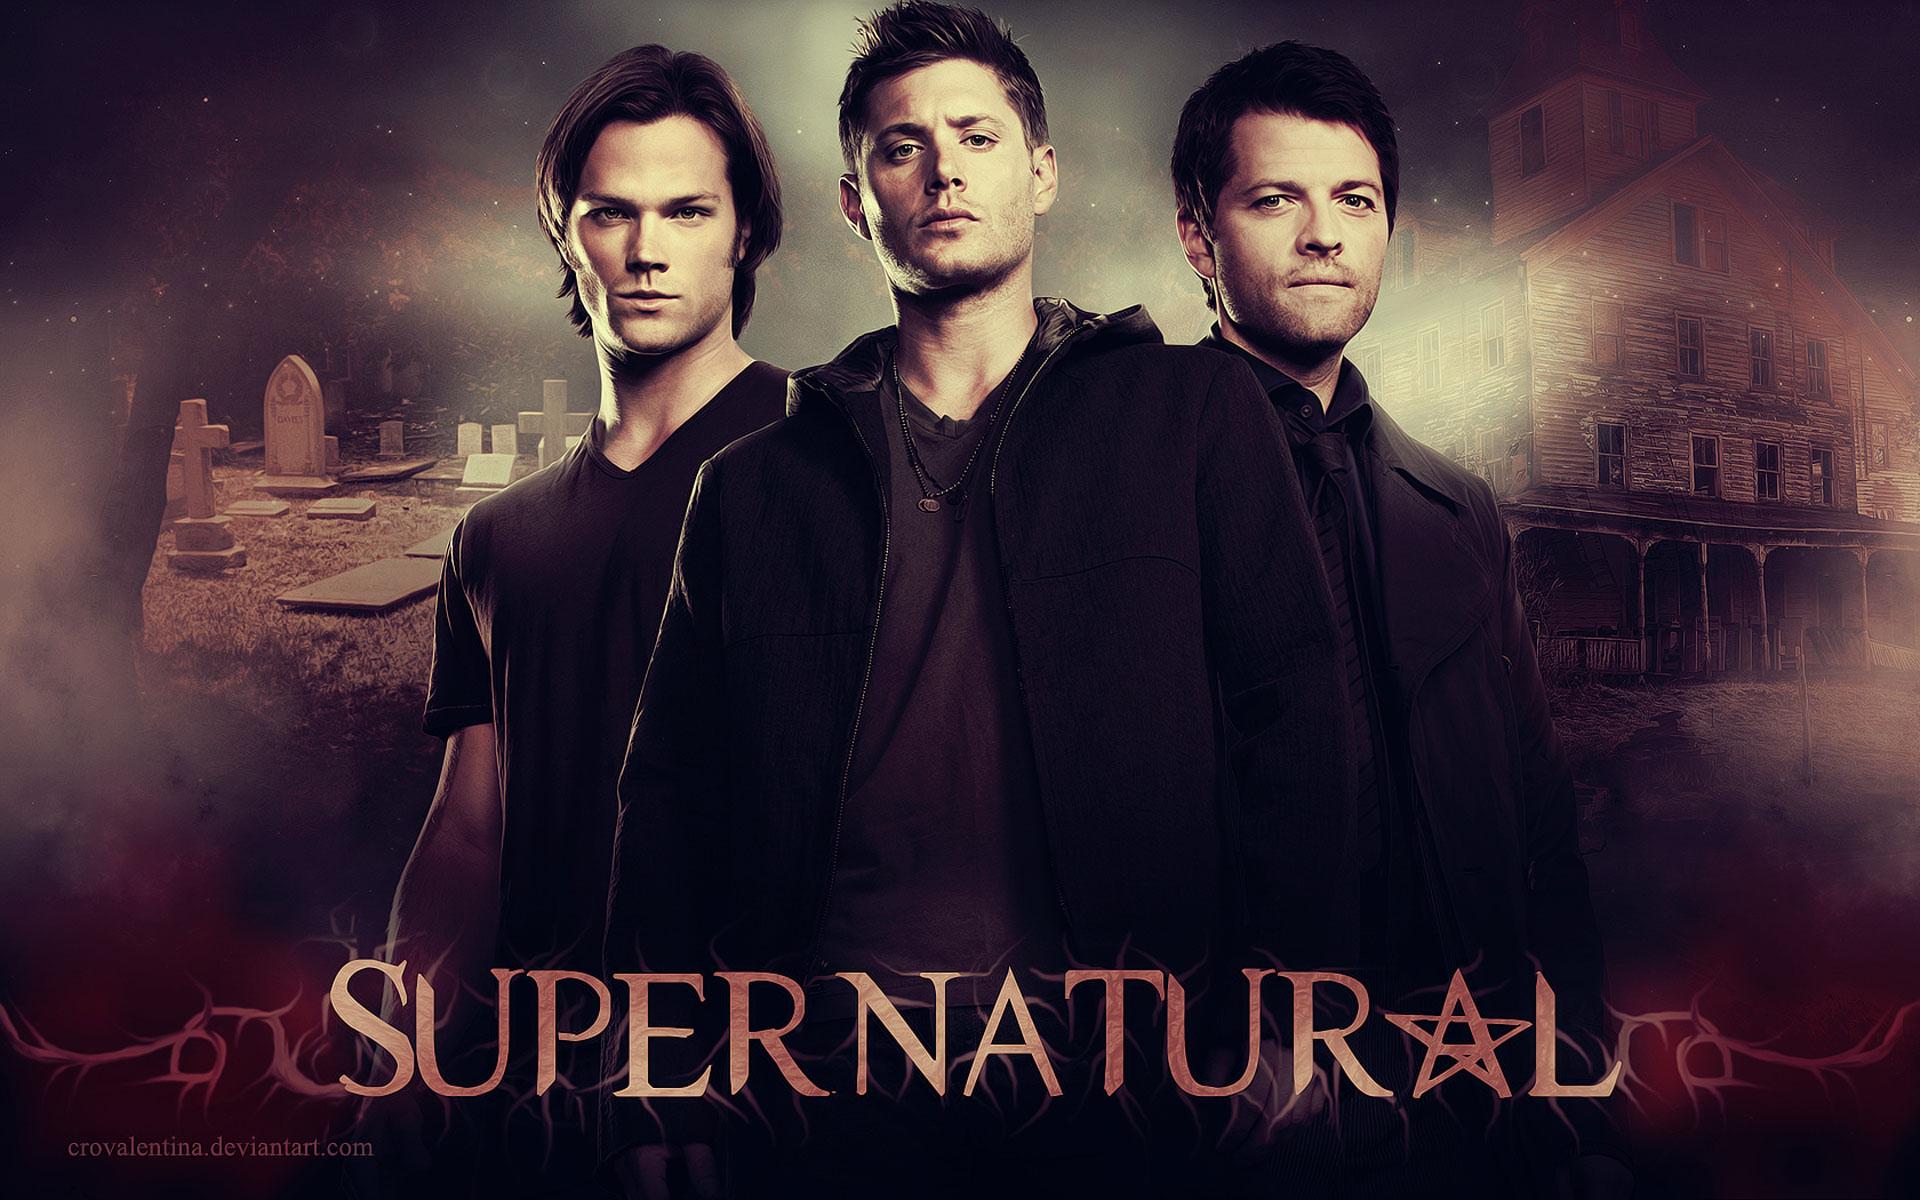 supernatural_team_wallpaper.jpg Supernatural 1920x1200. 1384. supernatural_dean_winchester_chevrolet_impala_sam_desktop_1920x1080_hd-wallpaper-666237.jpg